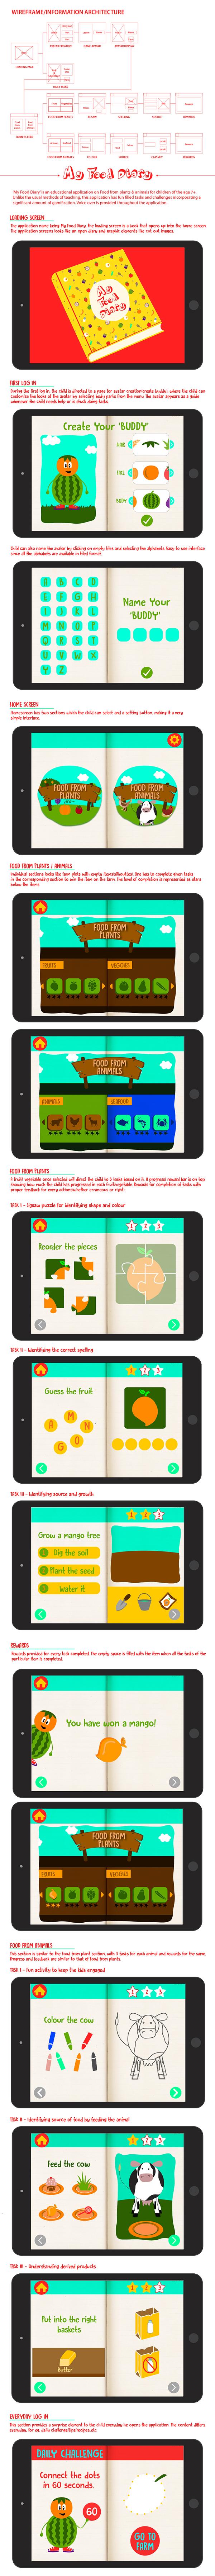 my food diary educational app design project ii on pantone